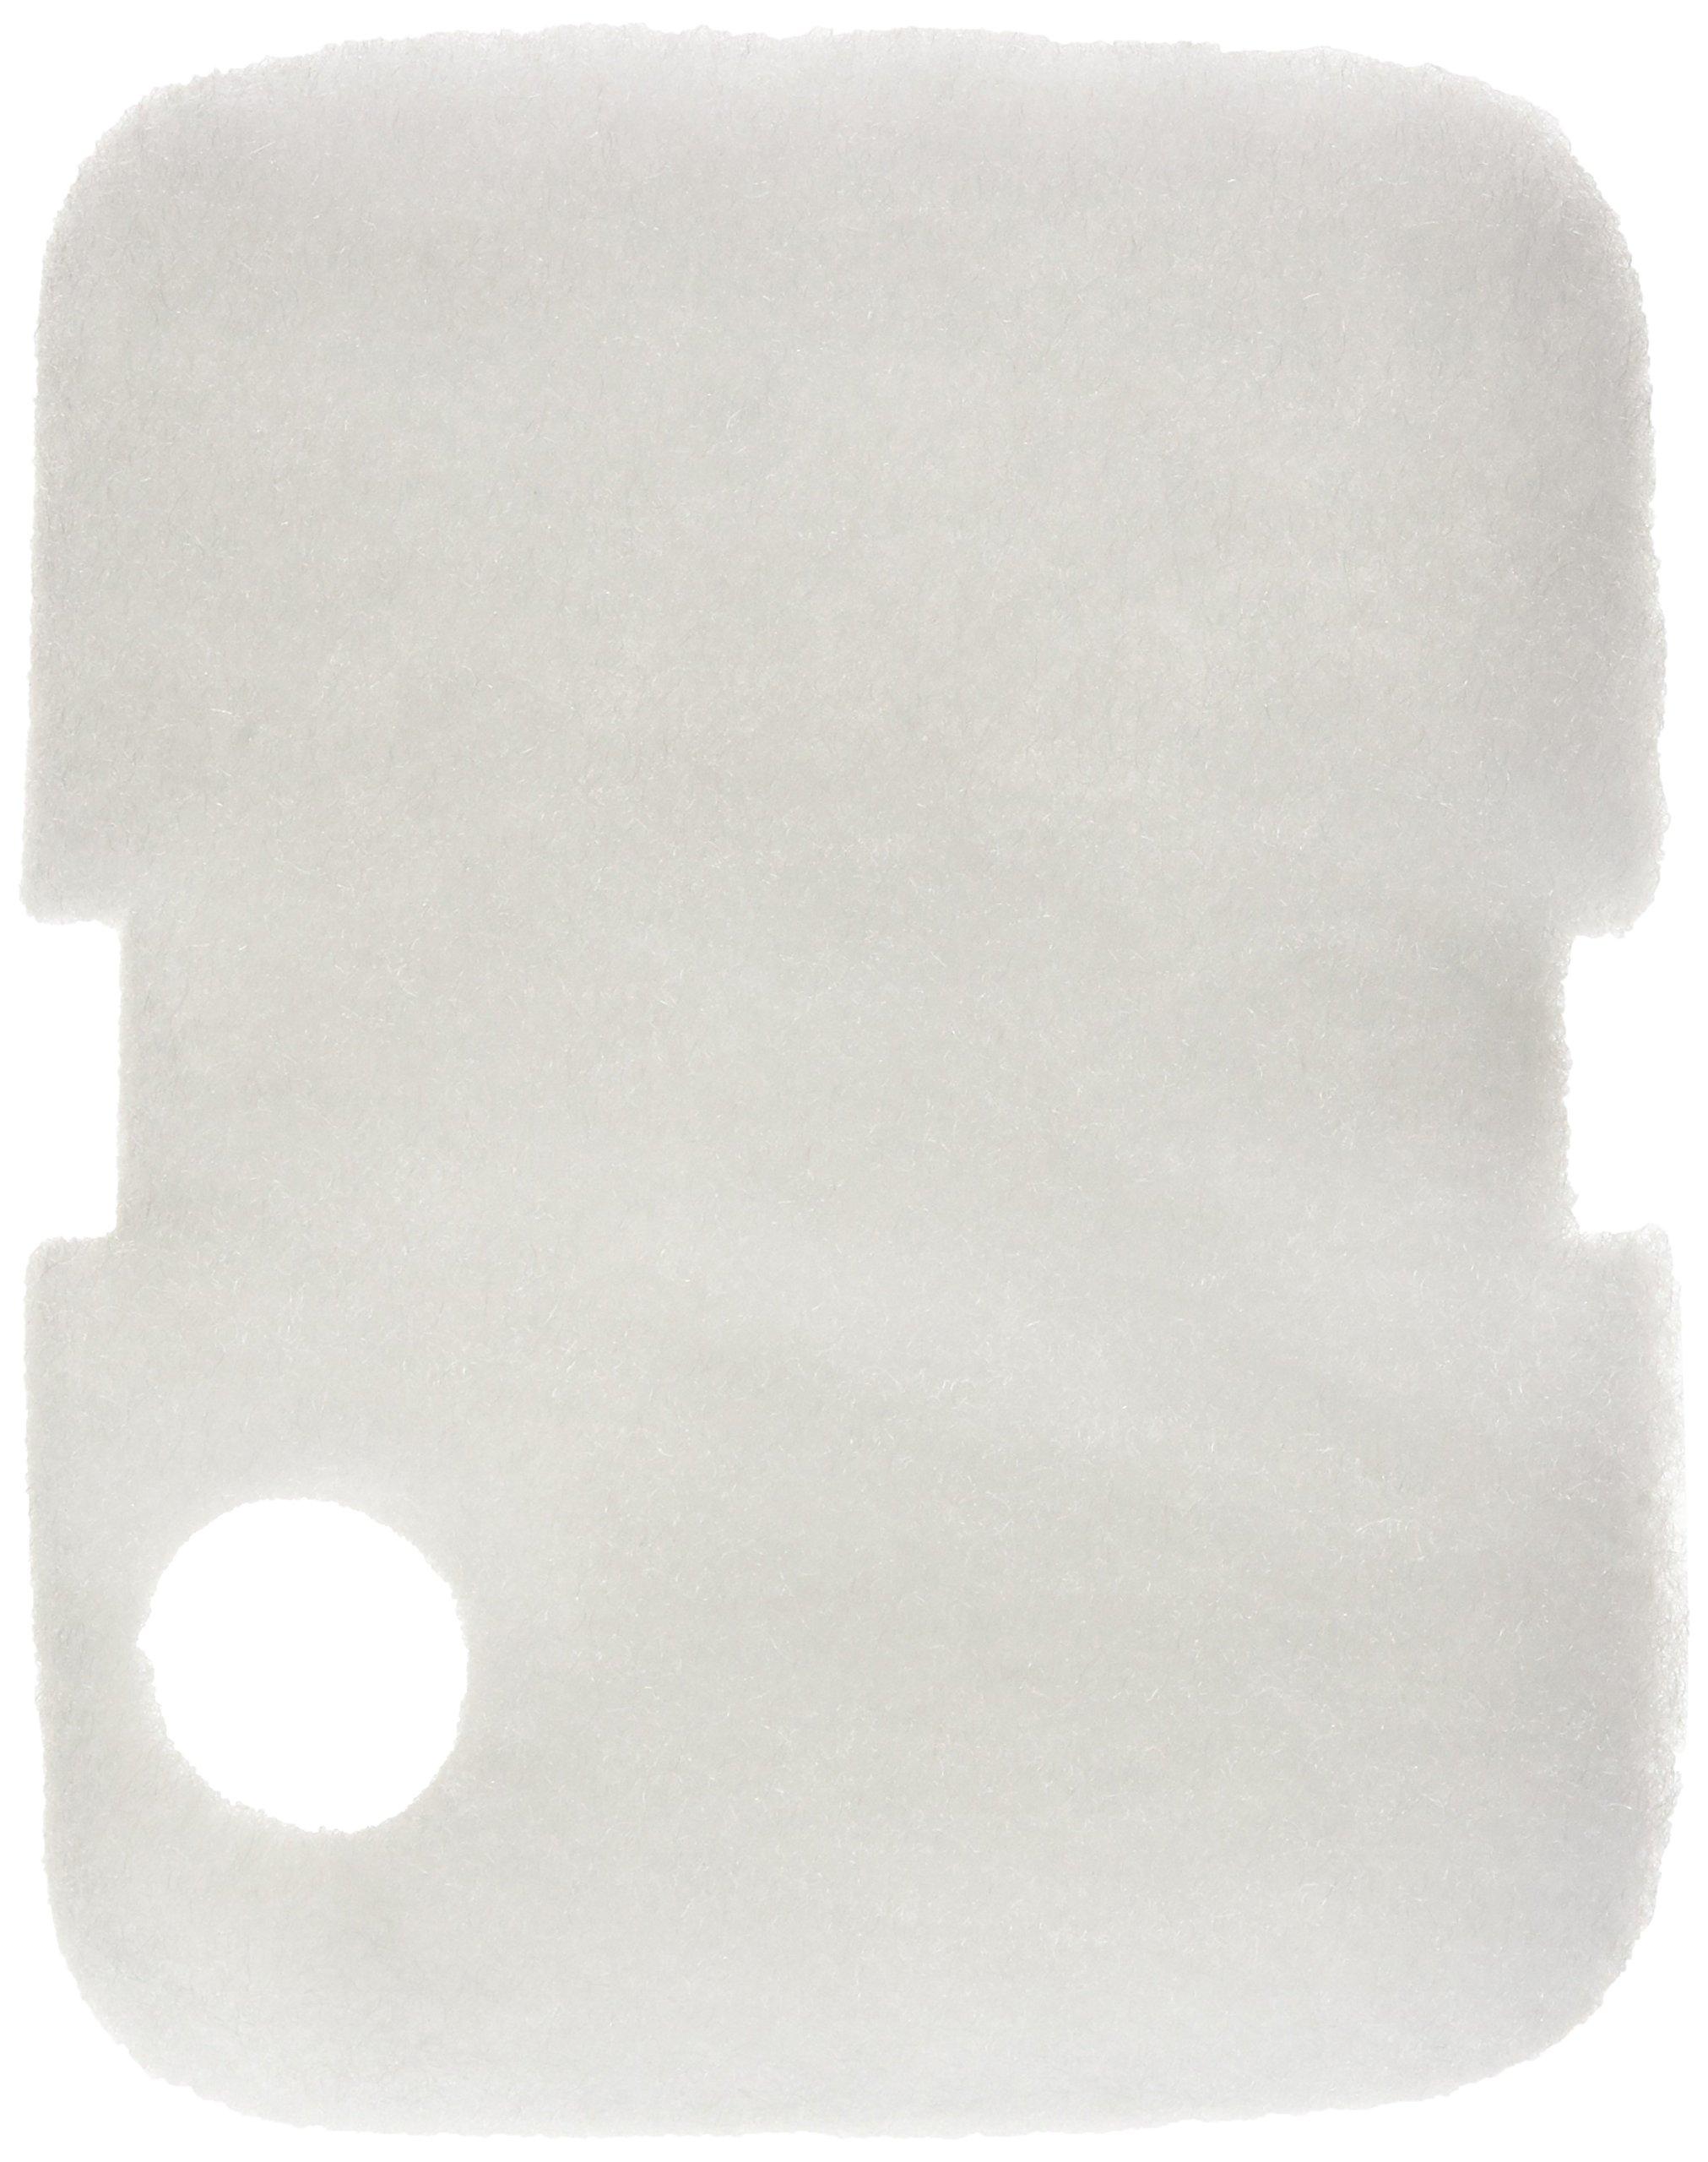 Penn Plax Cascade 700 1000 GPH Floss Pads – Filter Pad Keeps Your Aquarium Clean and Clear – 6 Pack